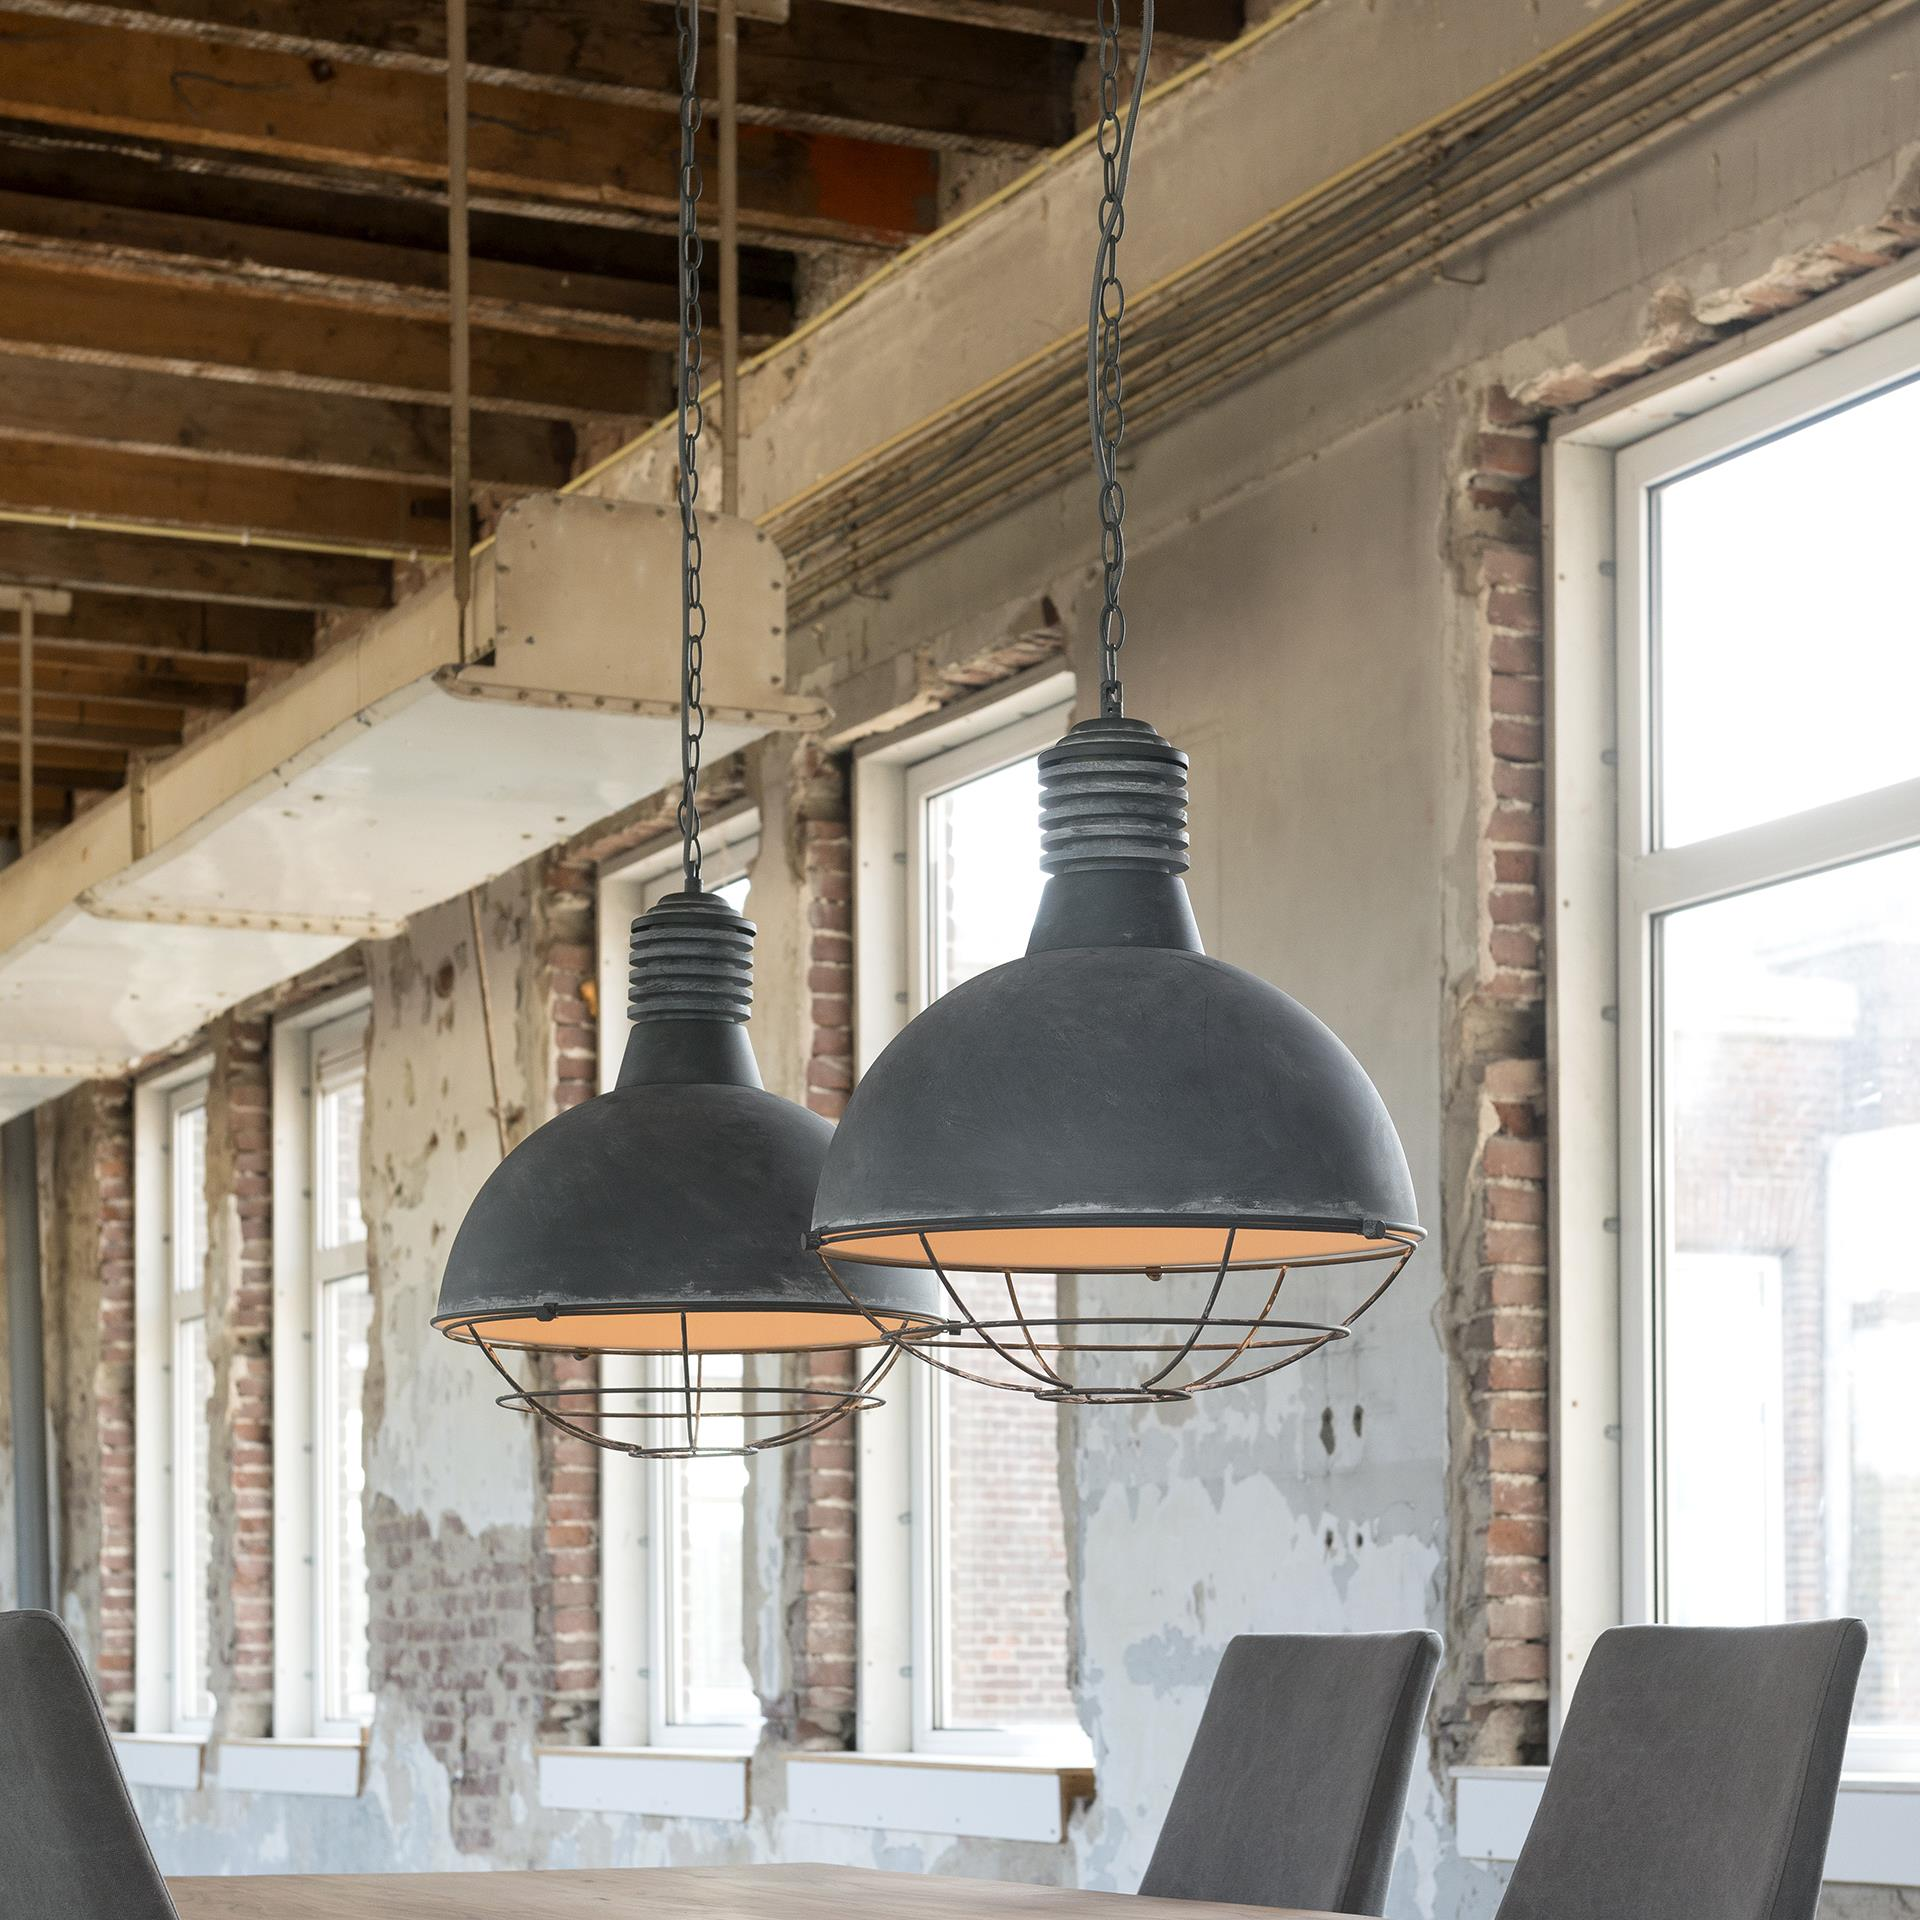 Industriële Hanglamp 'Trevon' met dubbele kap in betonlook, 41cm korting